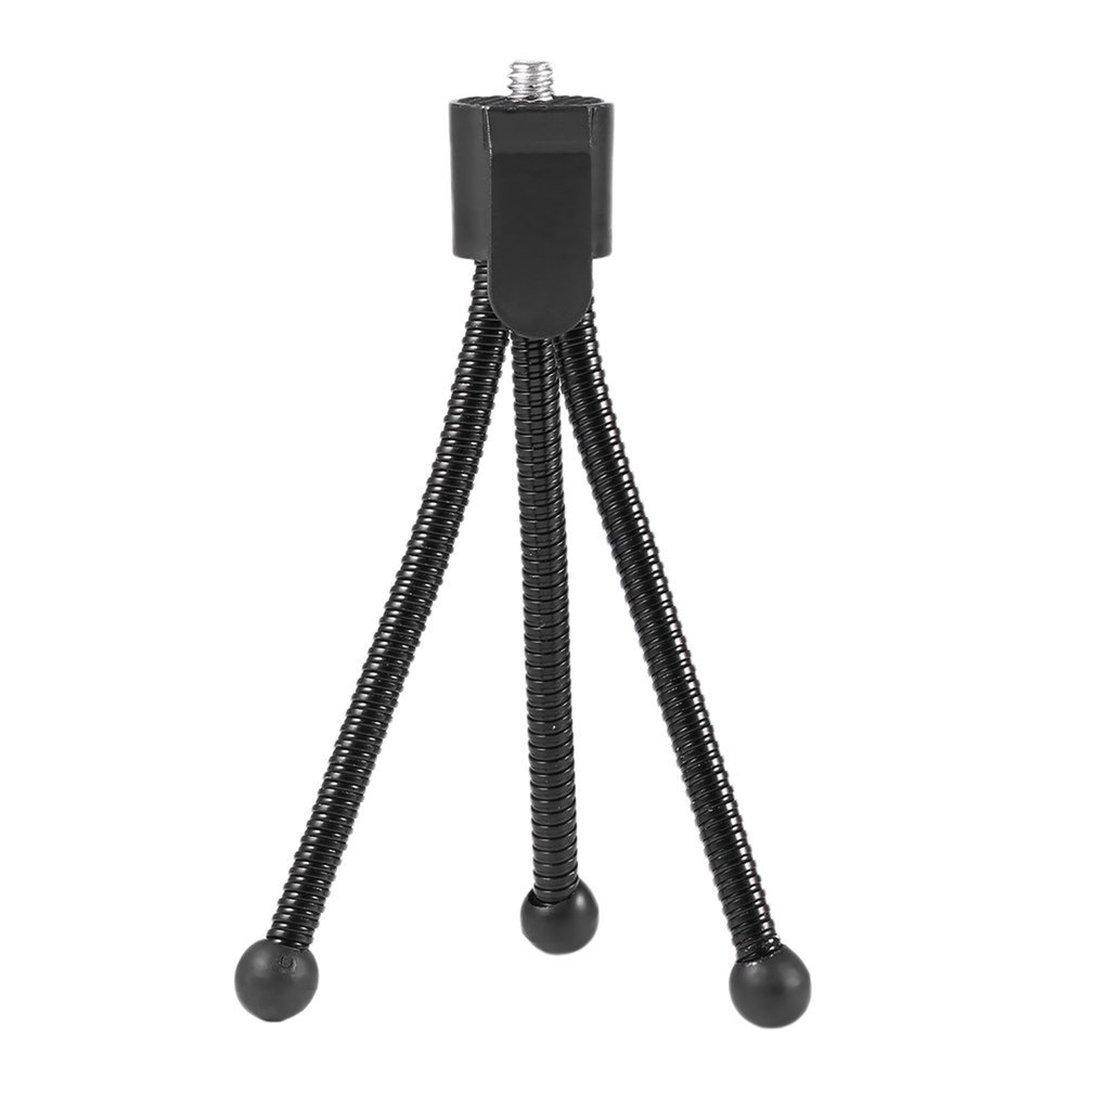 Universal Flexible Mini Port/átil Soporte para Tr/ípode de Metal Port/átil para C/ámara Digital Mini DV Proyector Accesorios de Viaje ToGames-ES